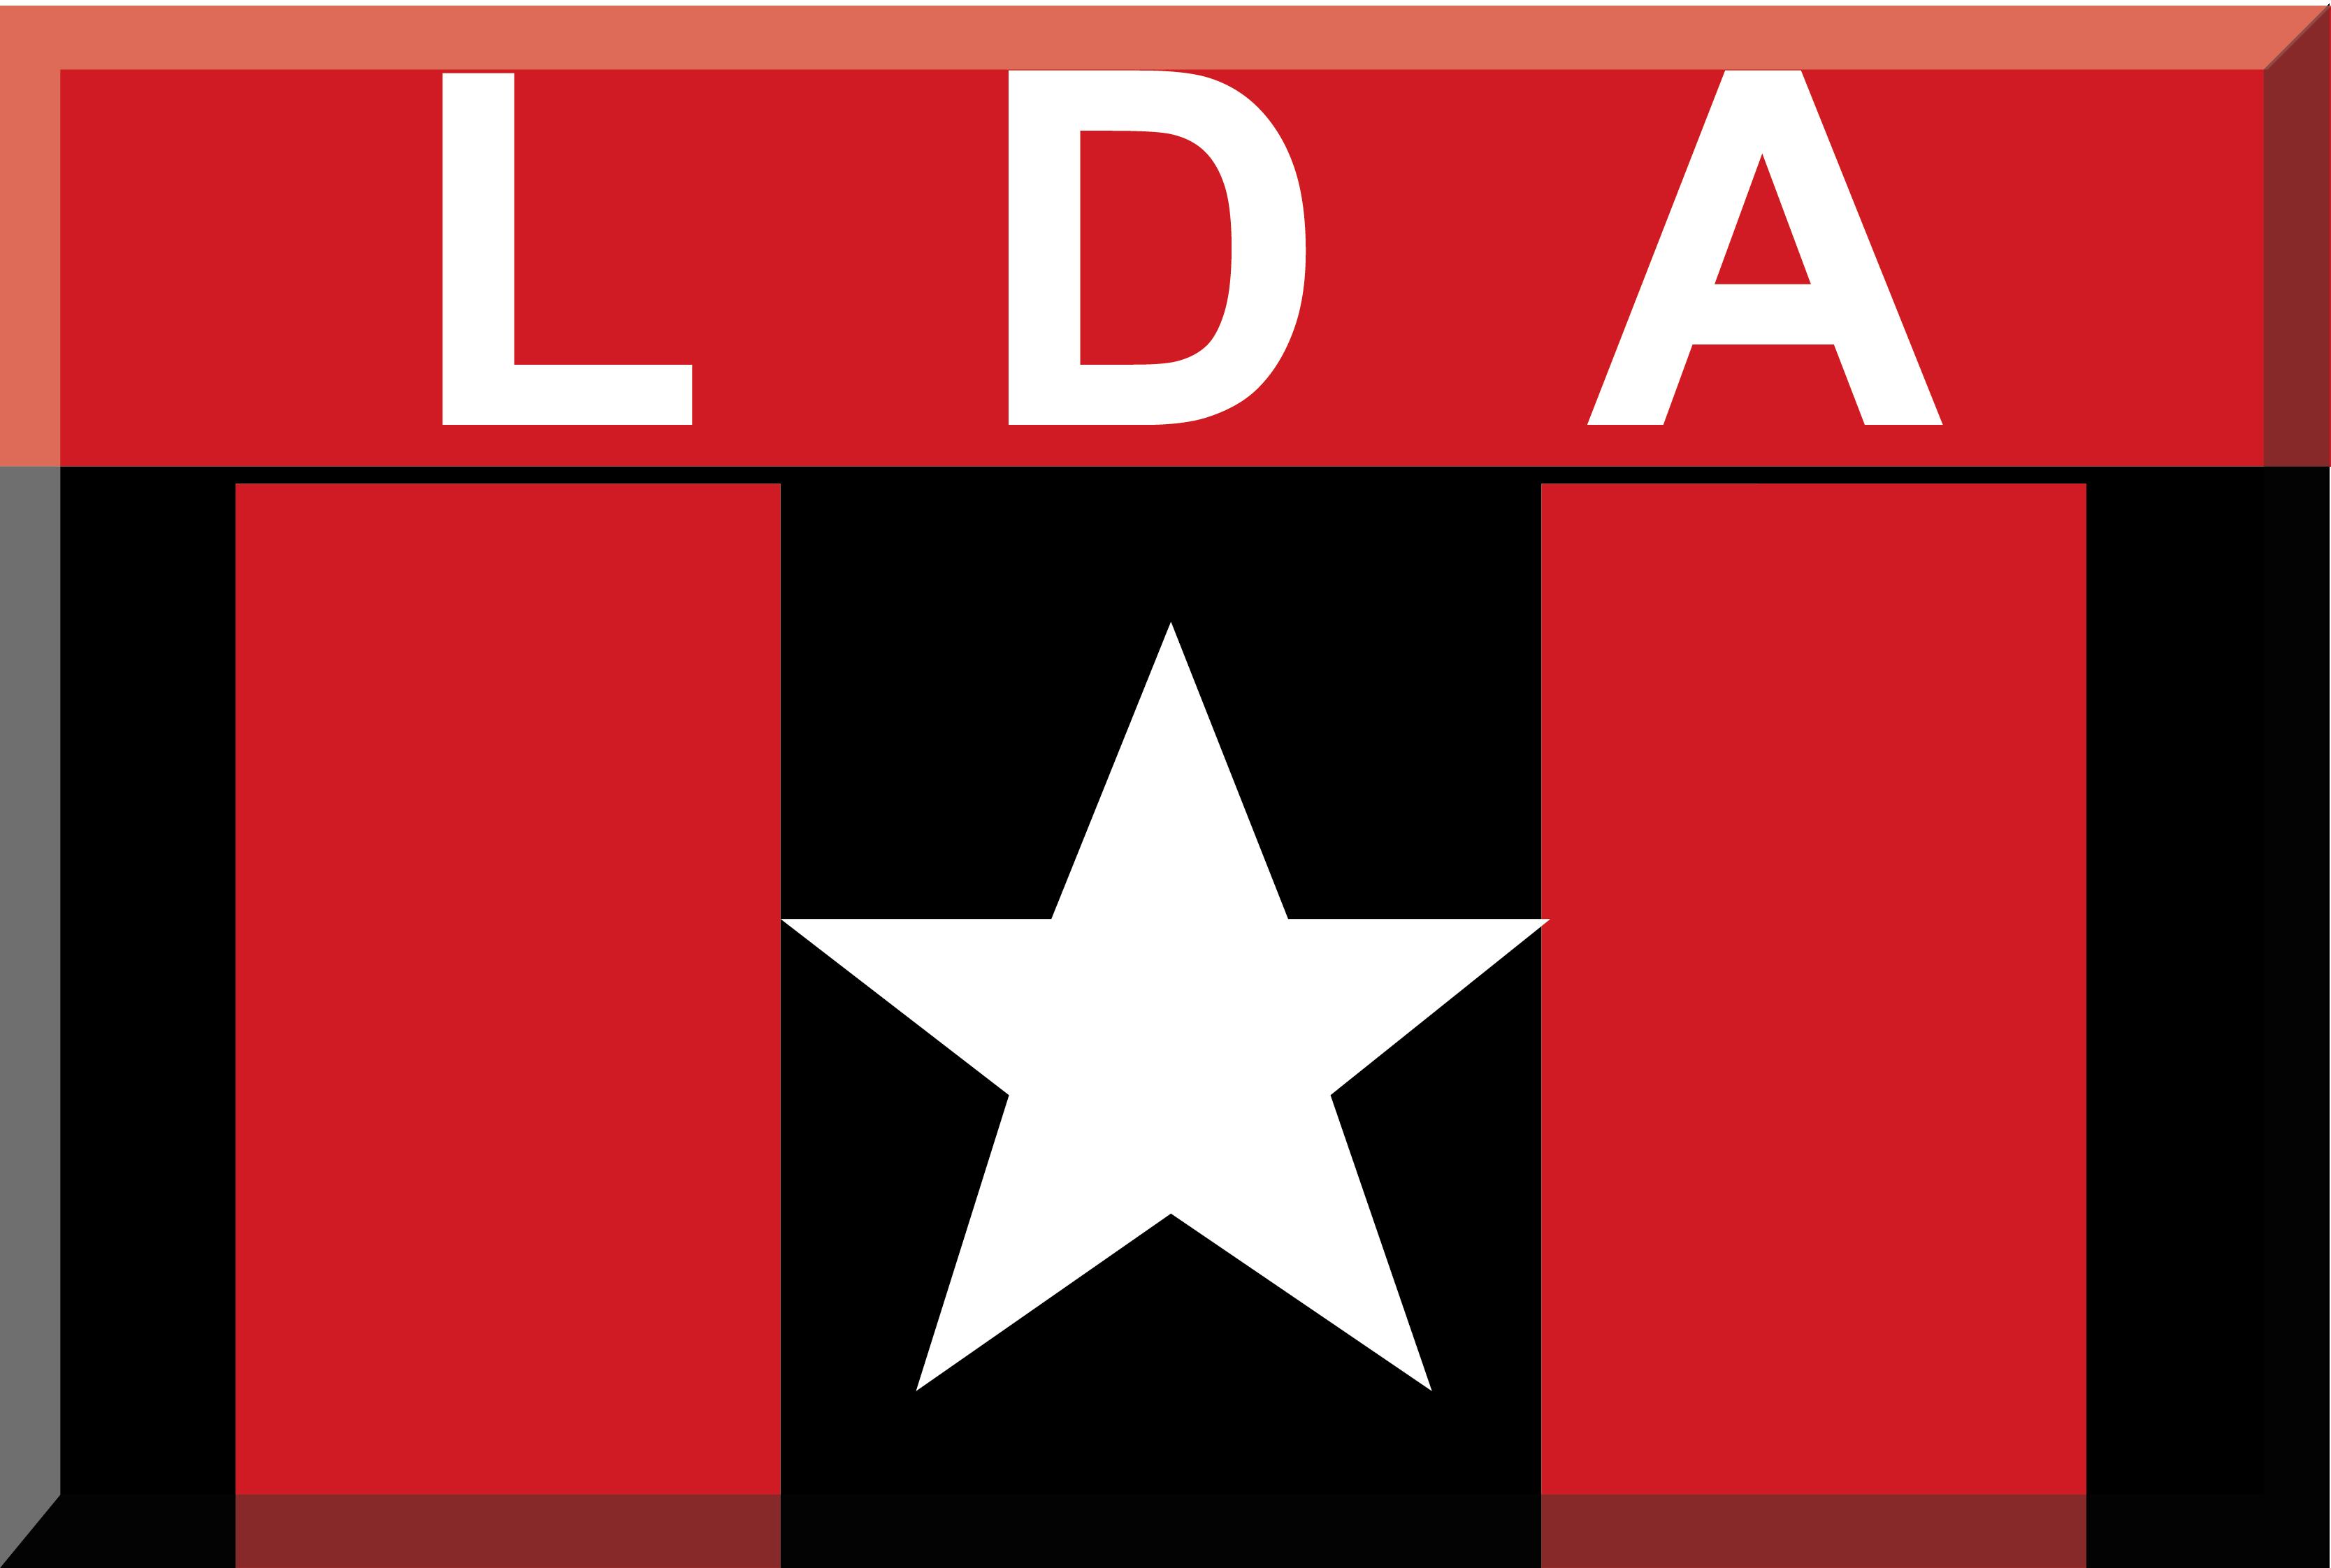 La Liga Deportiva Alajuelense